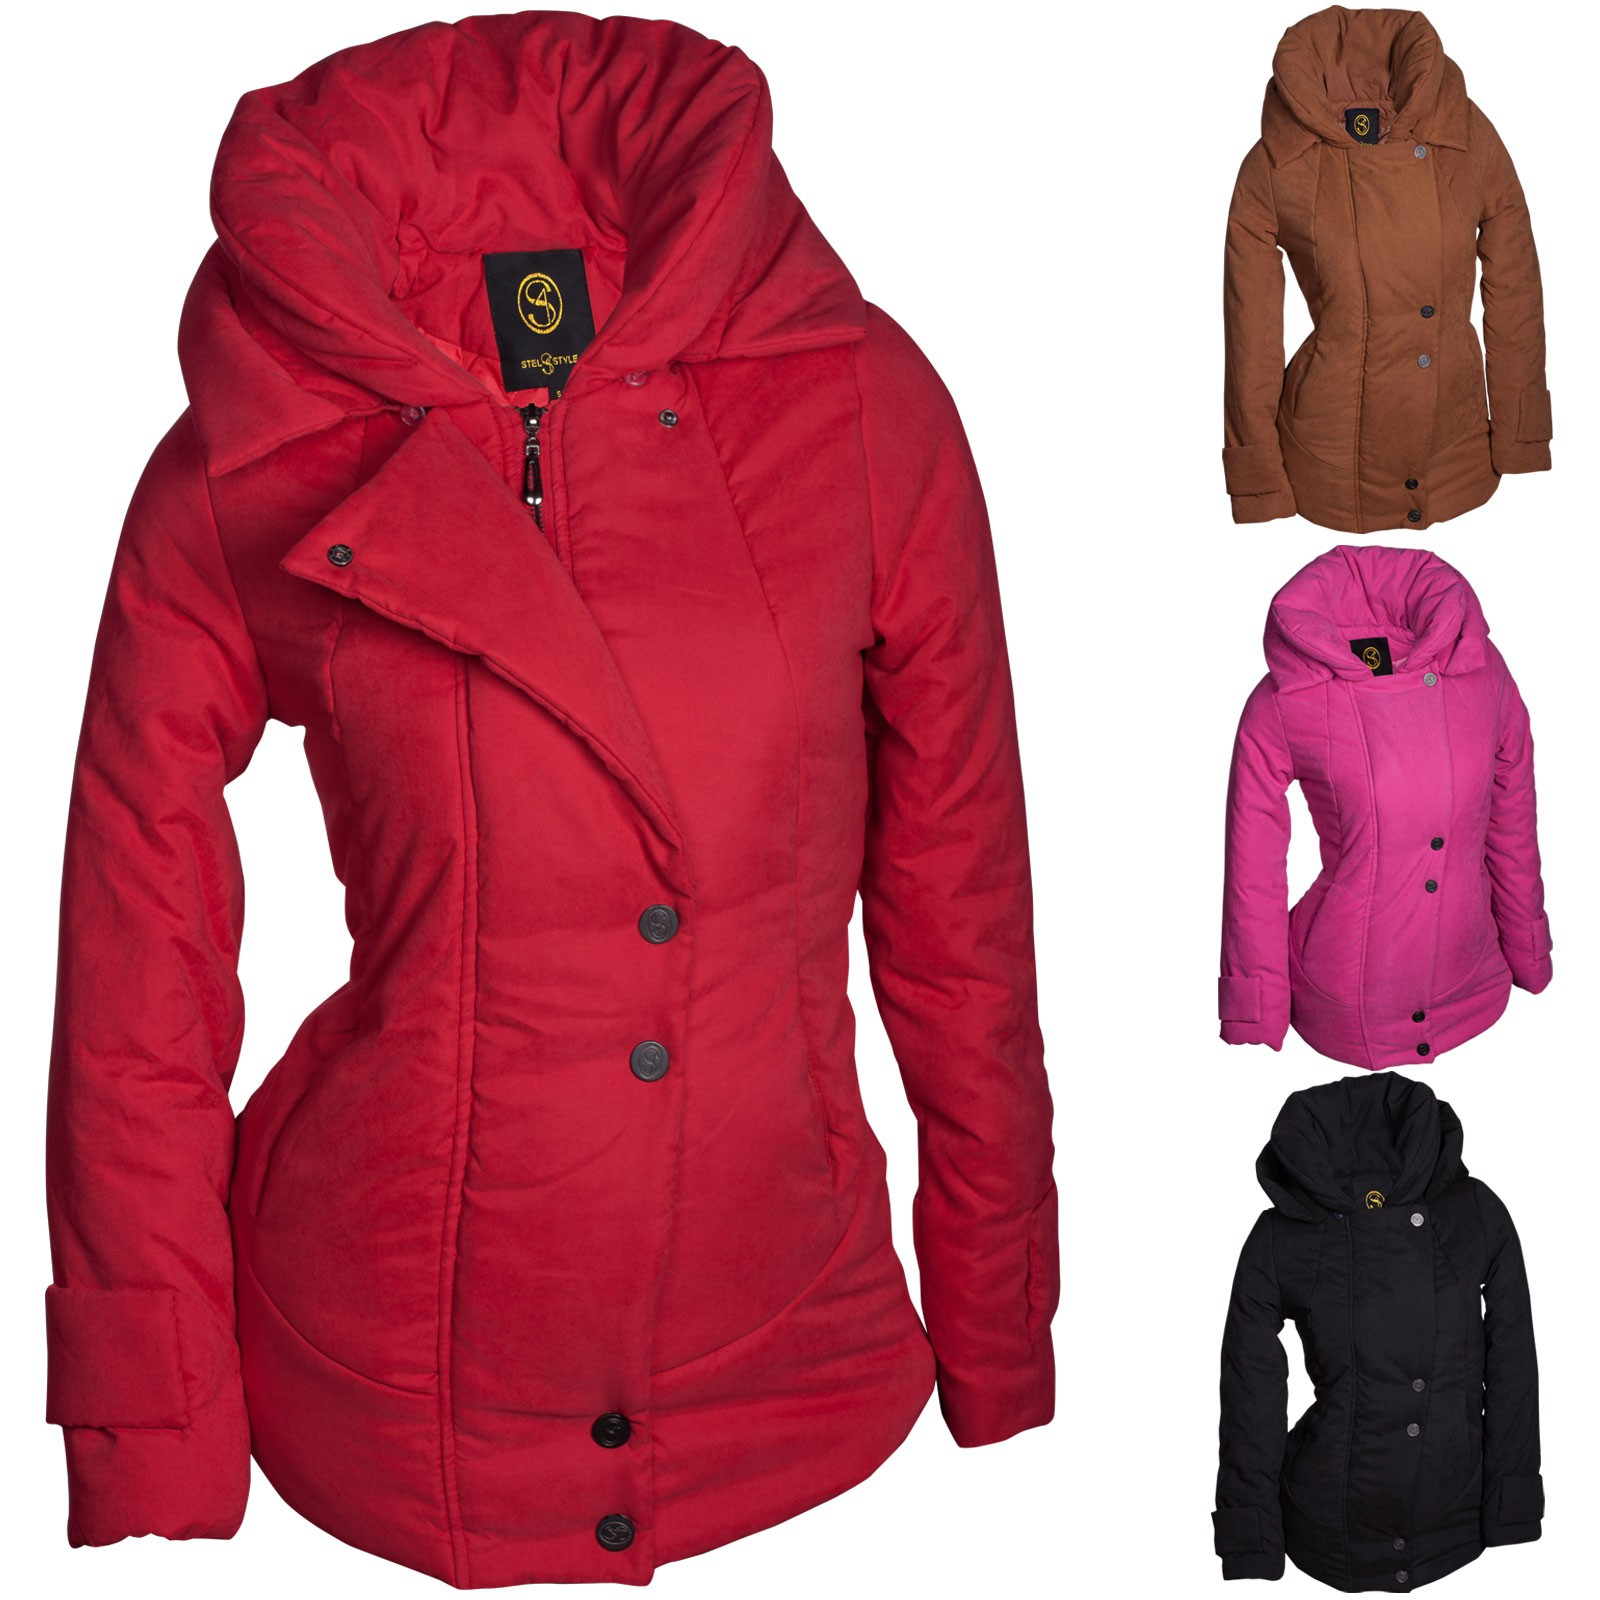 winter damen jacke parka kapuze mantel daunen winterjacke outdoor warm s m l xl damen mode jacken. Black Bedroom Furniture Sets. Home Design Ideas